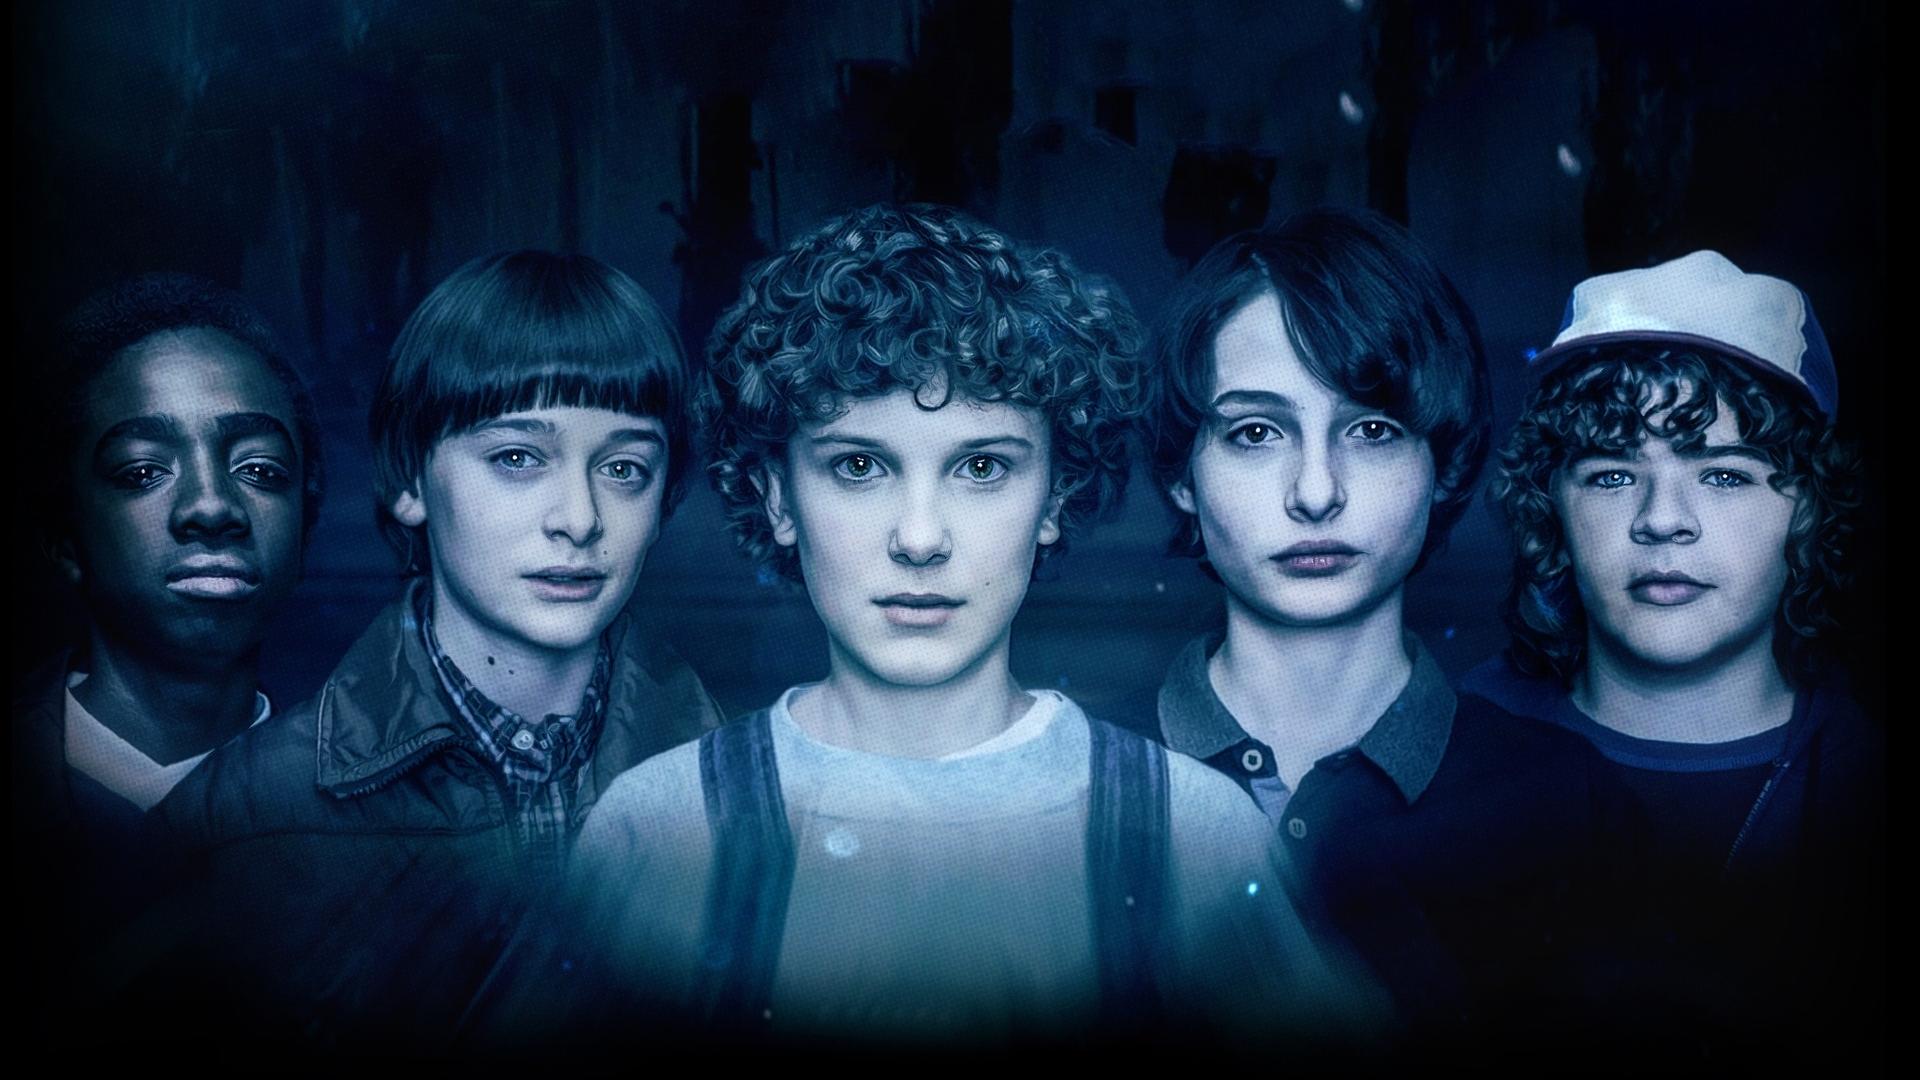 1920x1080 stranger things season 2 2017 poster laptop full hd 1080p